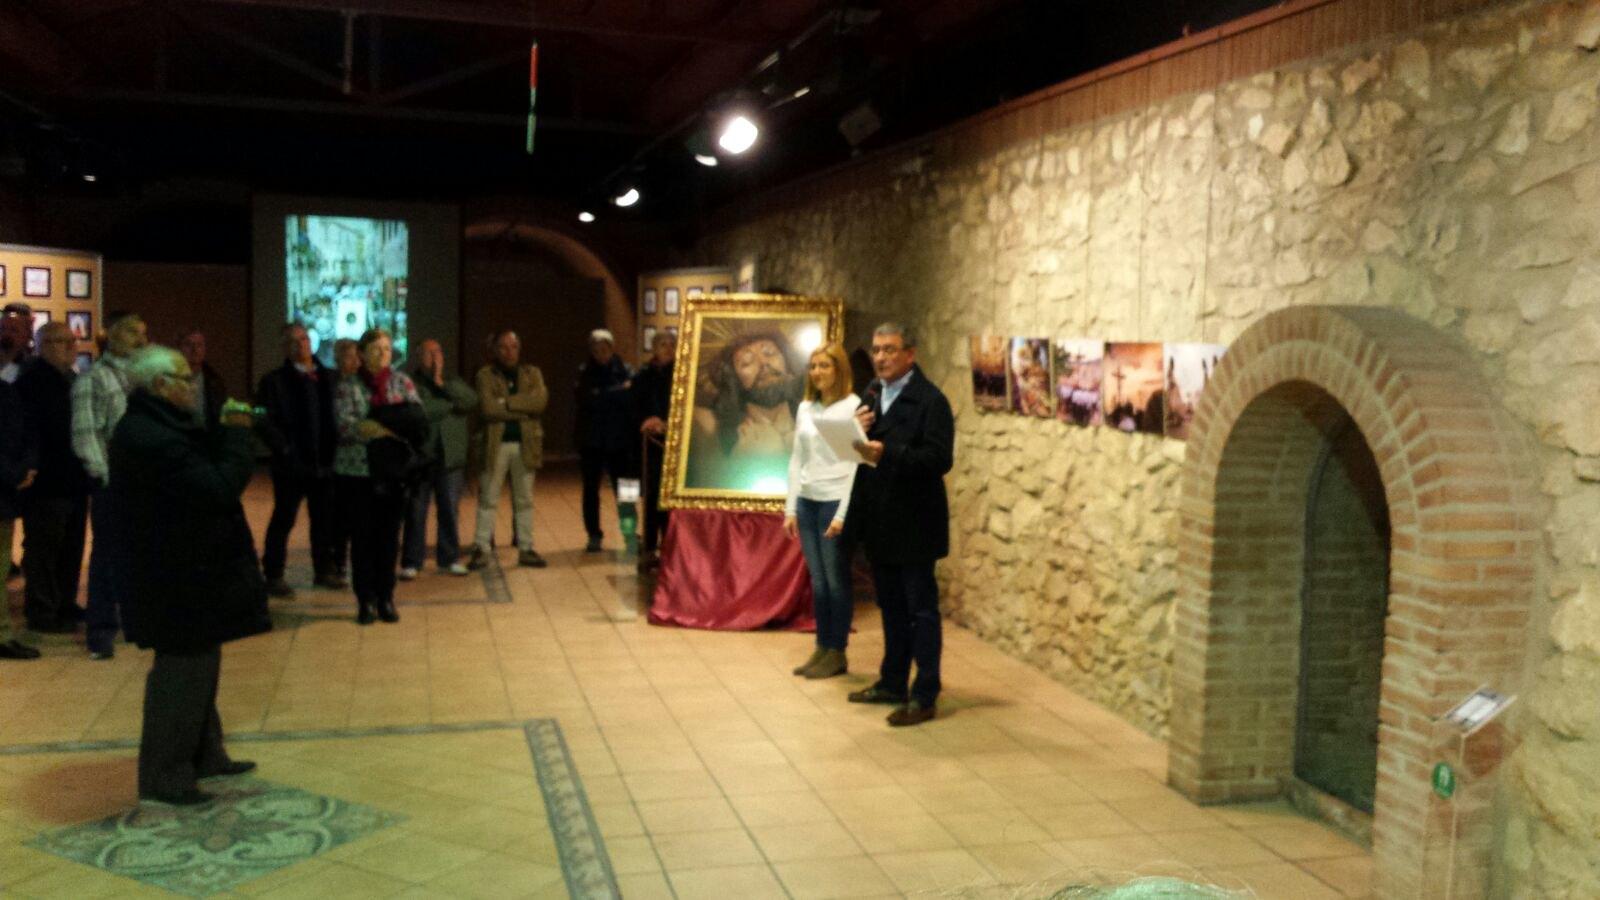 (2017-12-06) Exposición fotográfica del Cristo - Adrián Romero Montesinos (02)